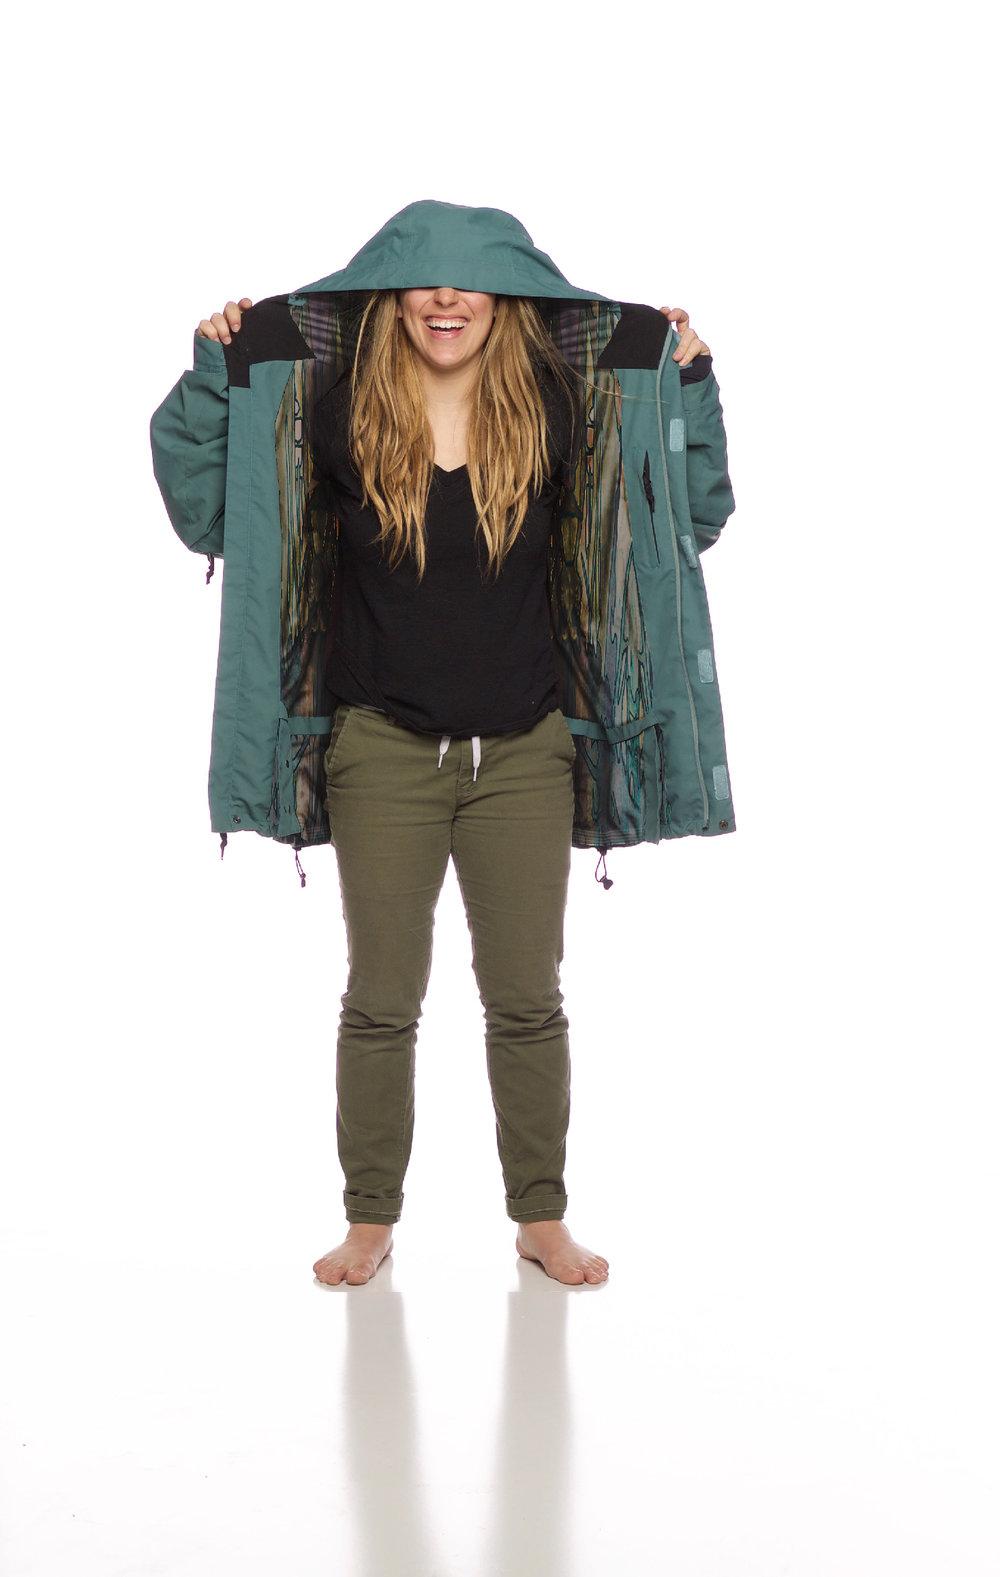 Anderson_Kristen_6_jacket-02.jpg